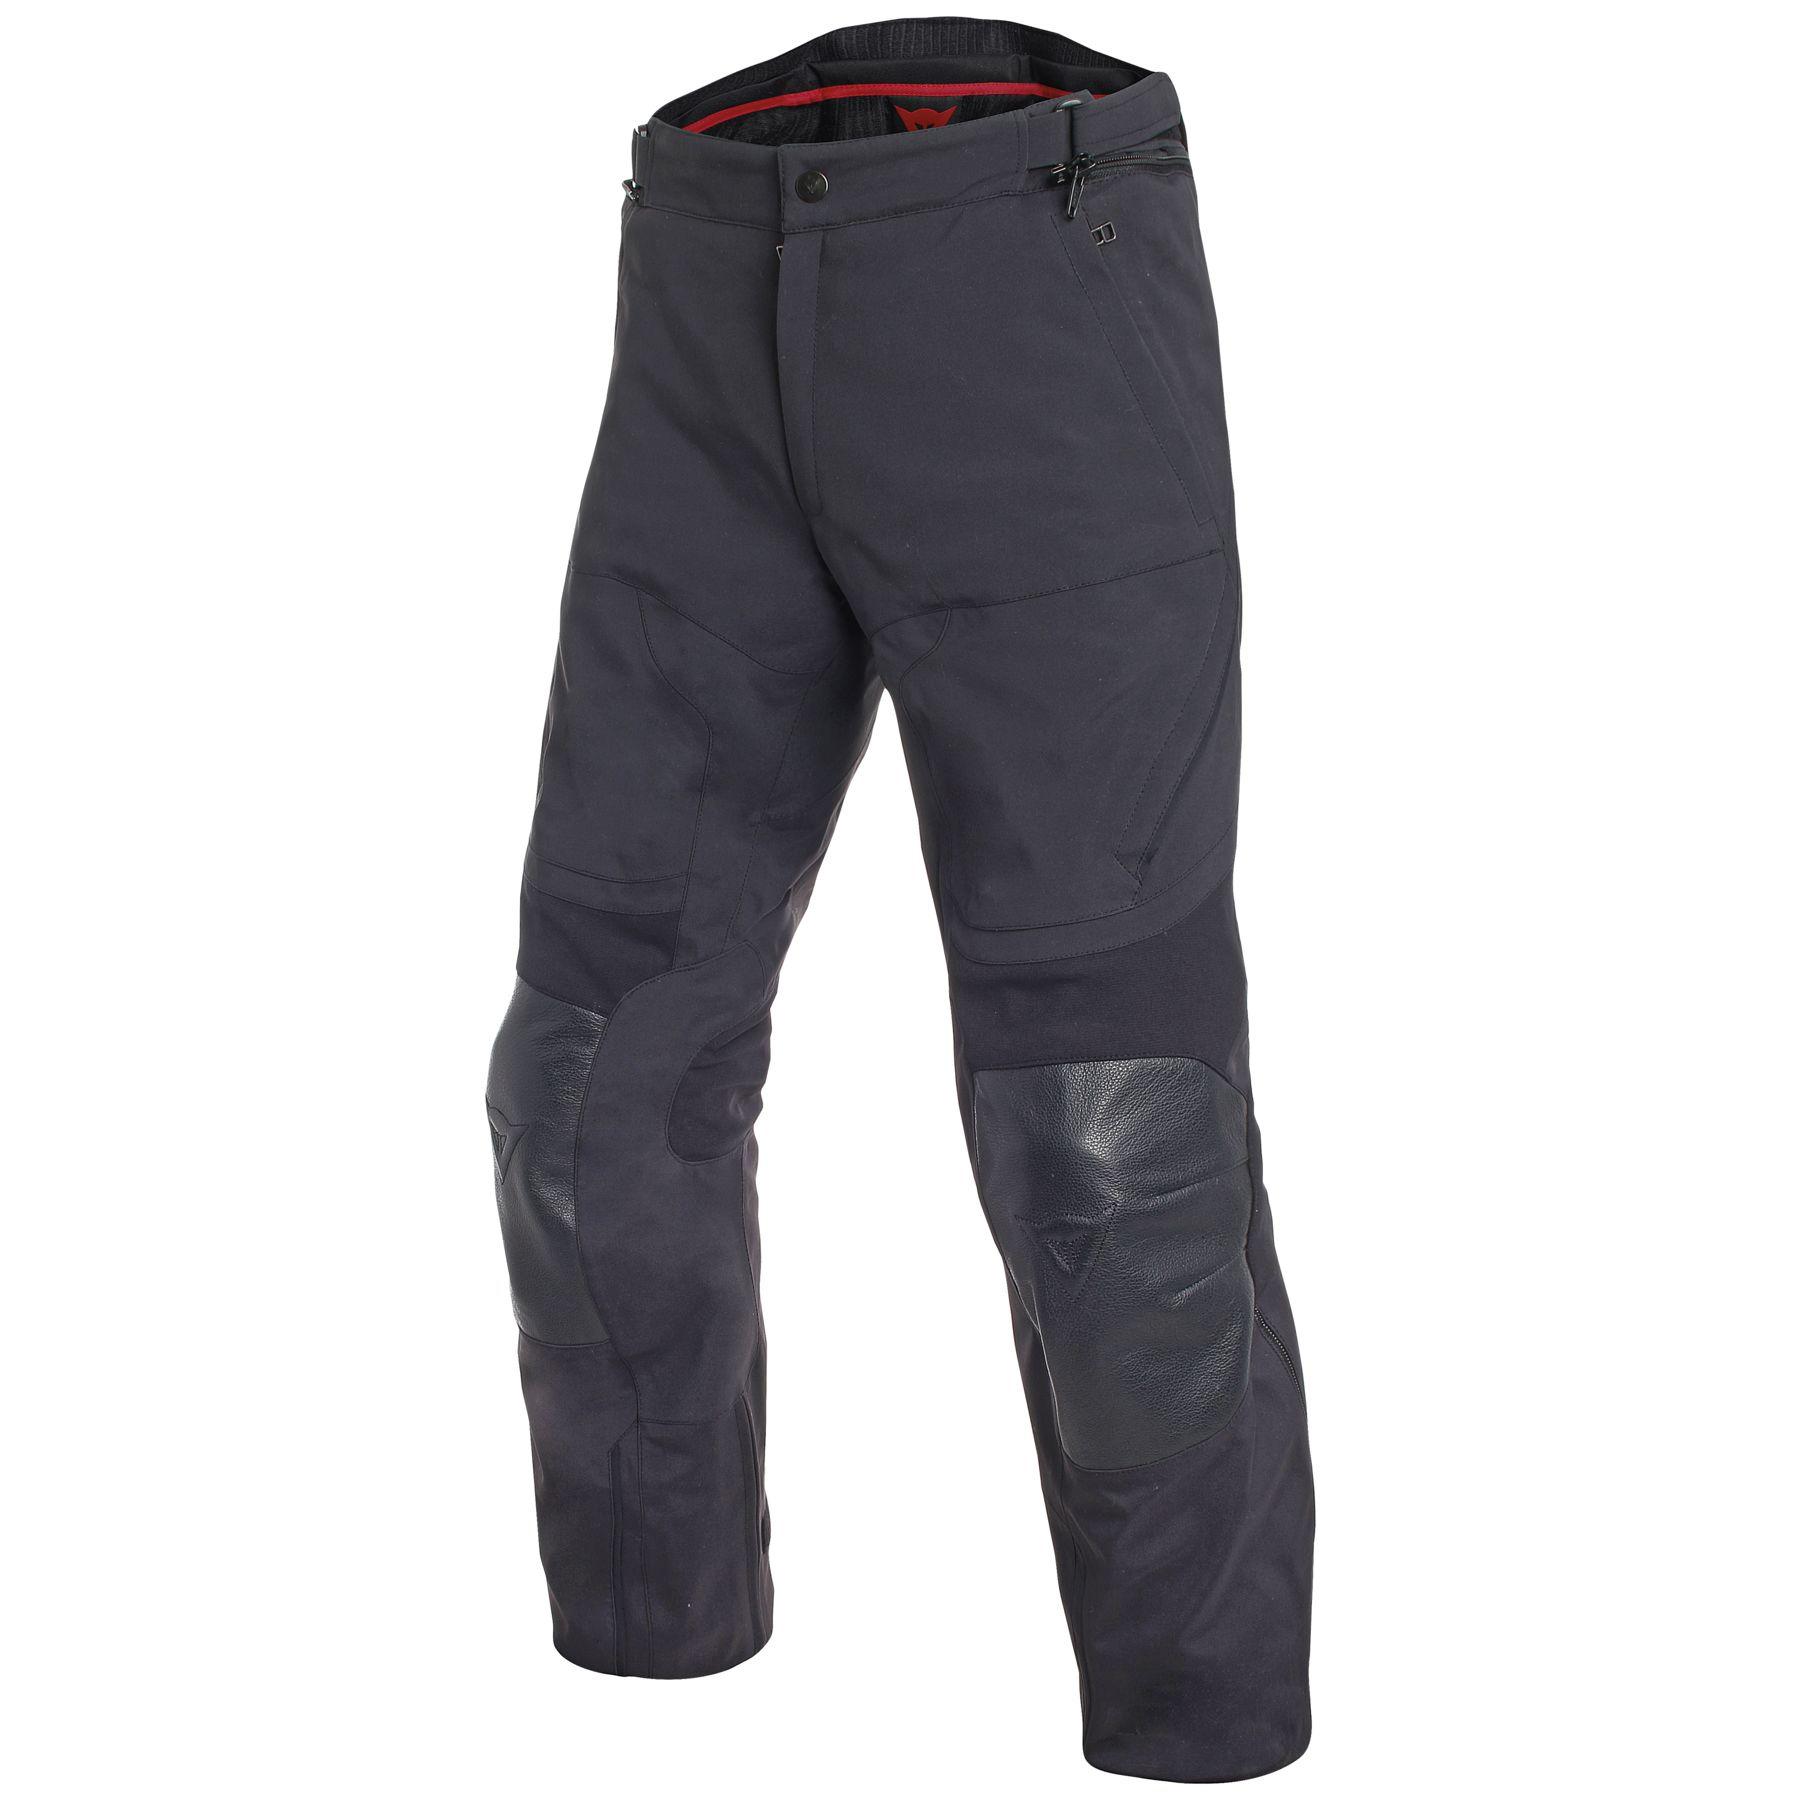 Dainese D-cyclone Goretex 2l Pants